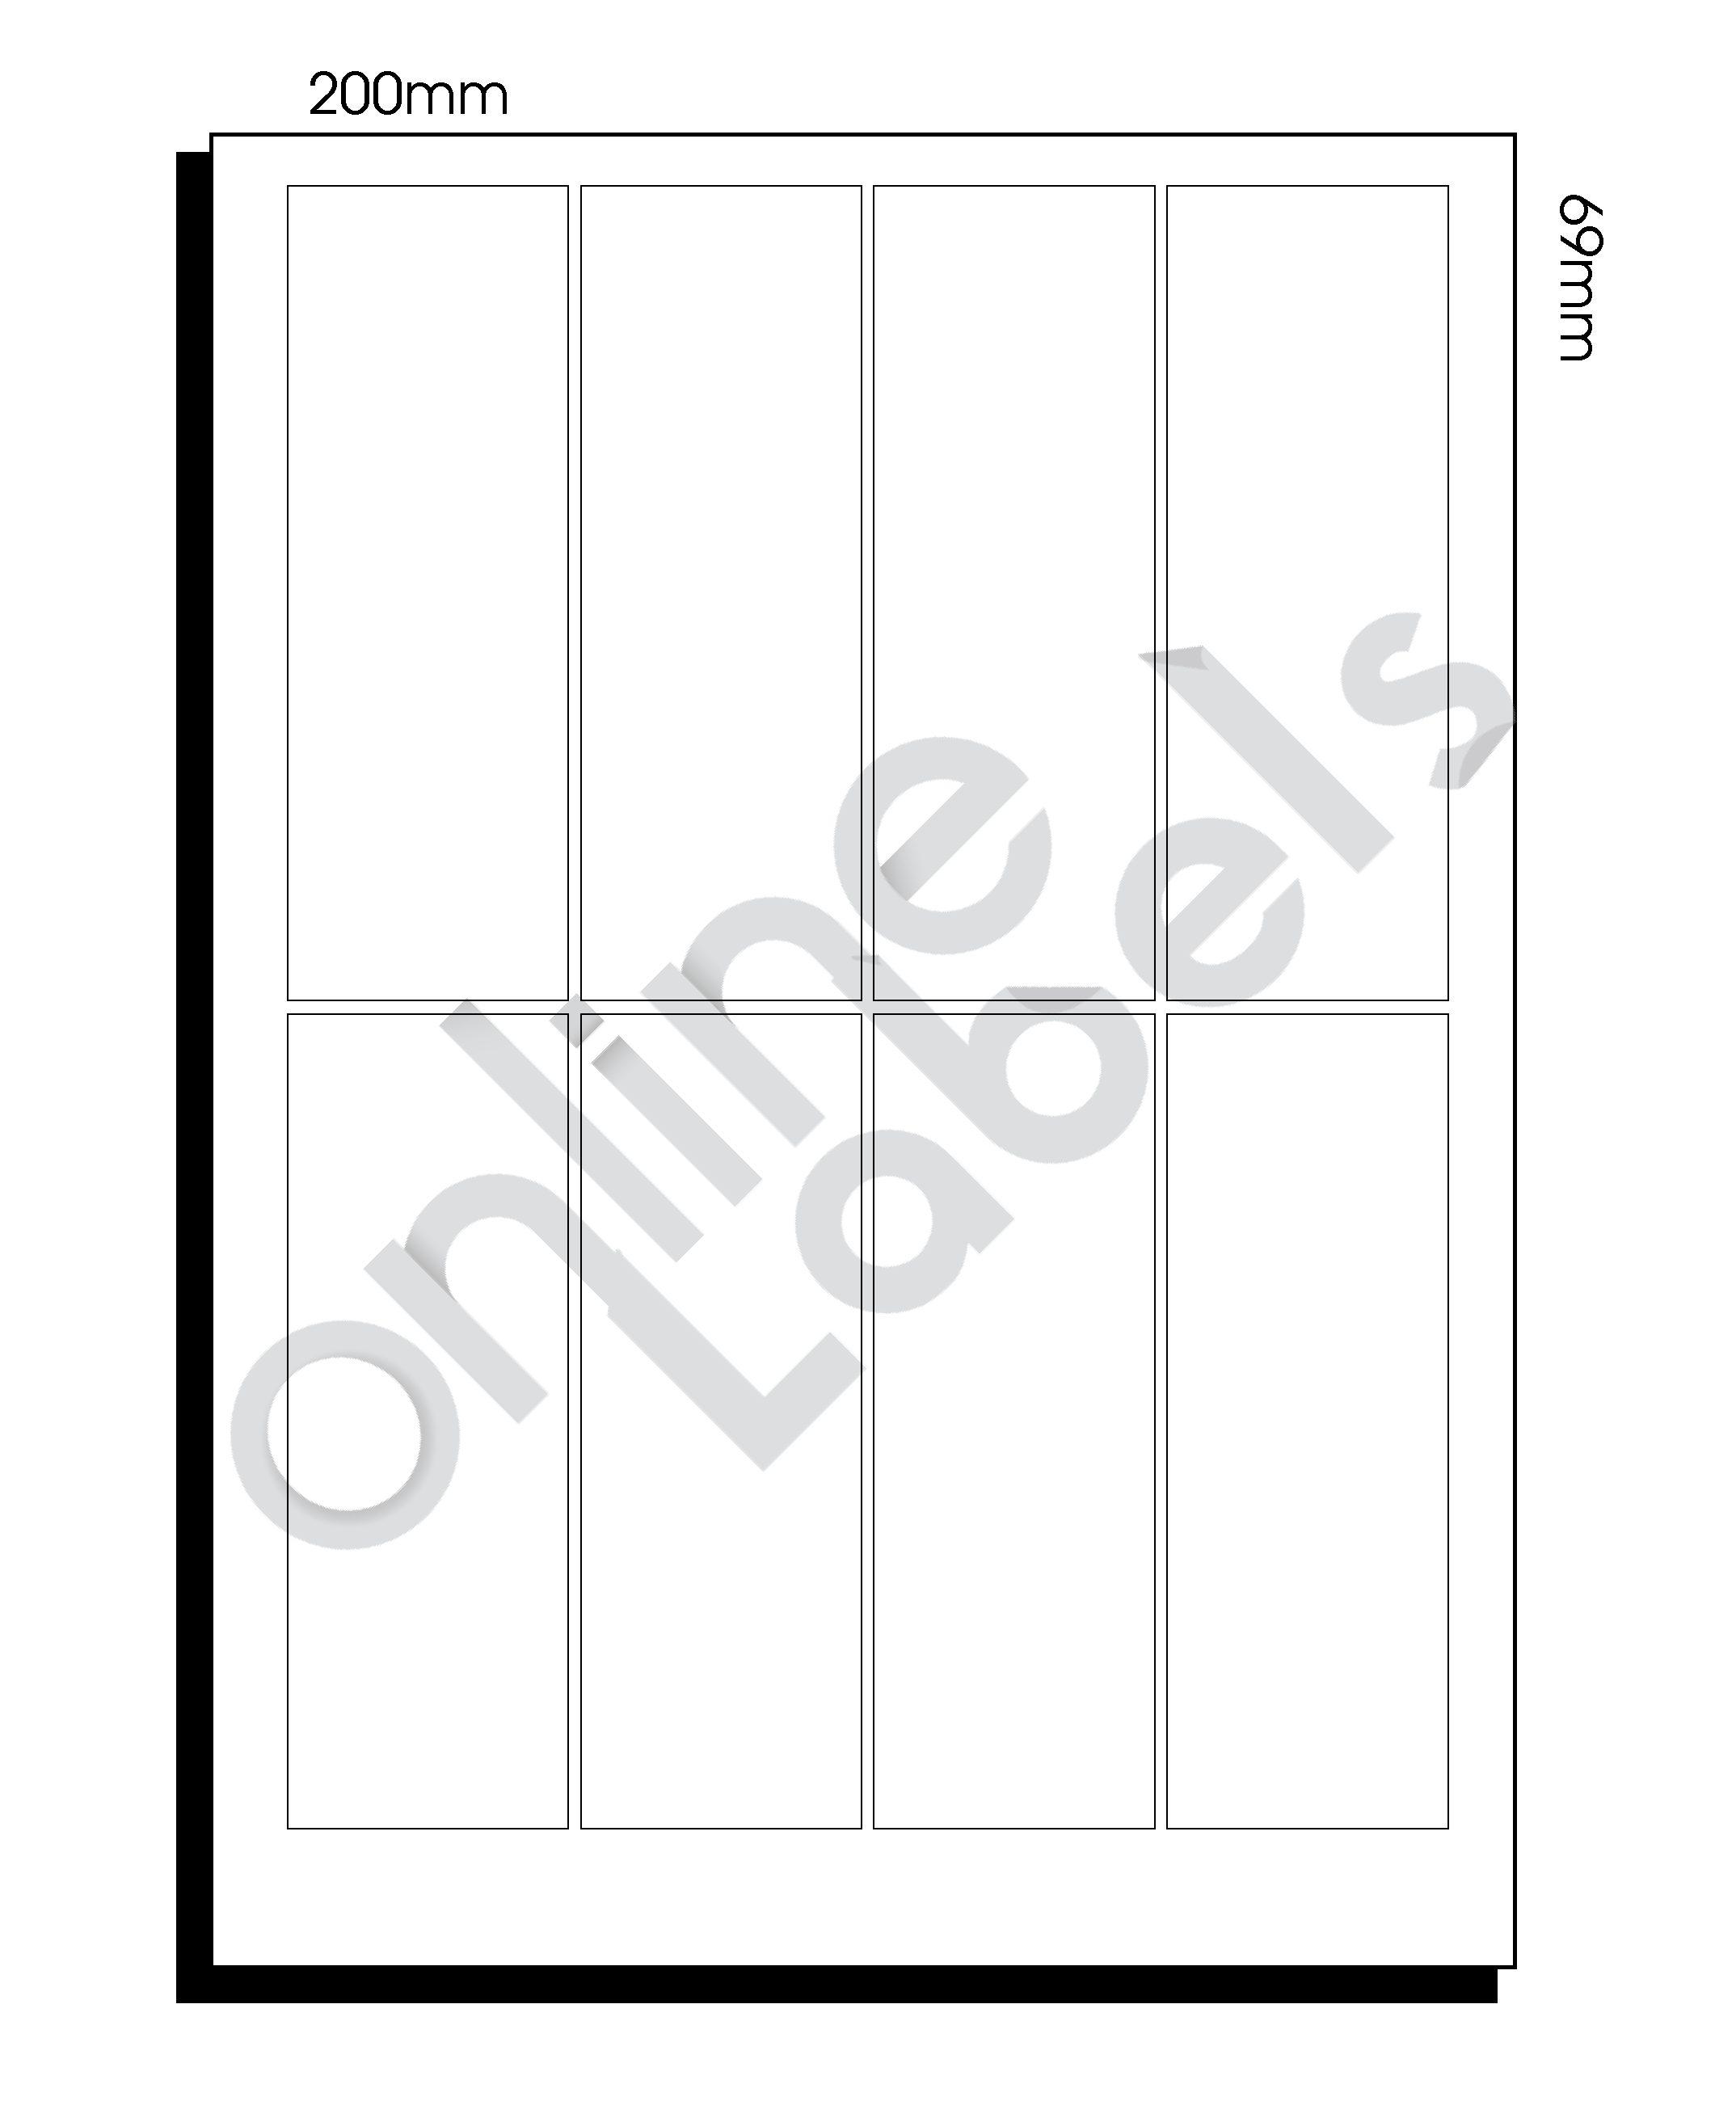 SR-A3 Diecut Labels – 200mm x 69mm